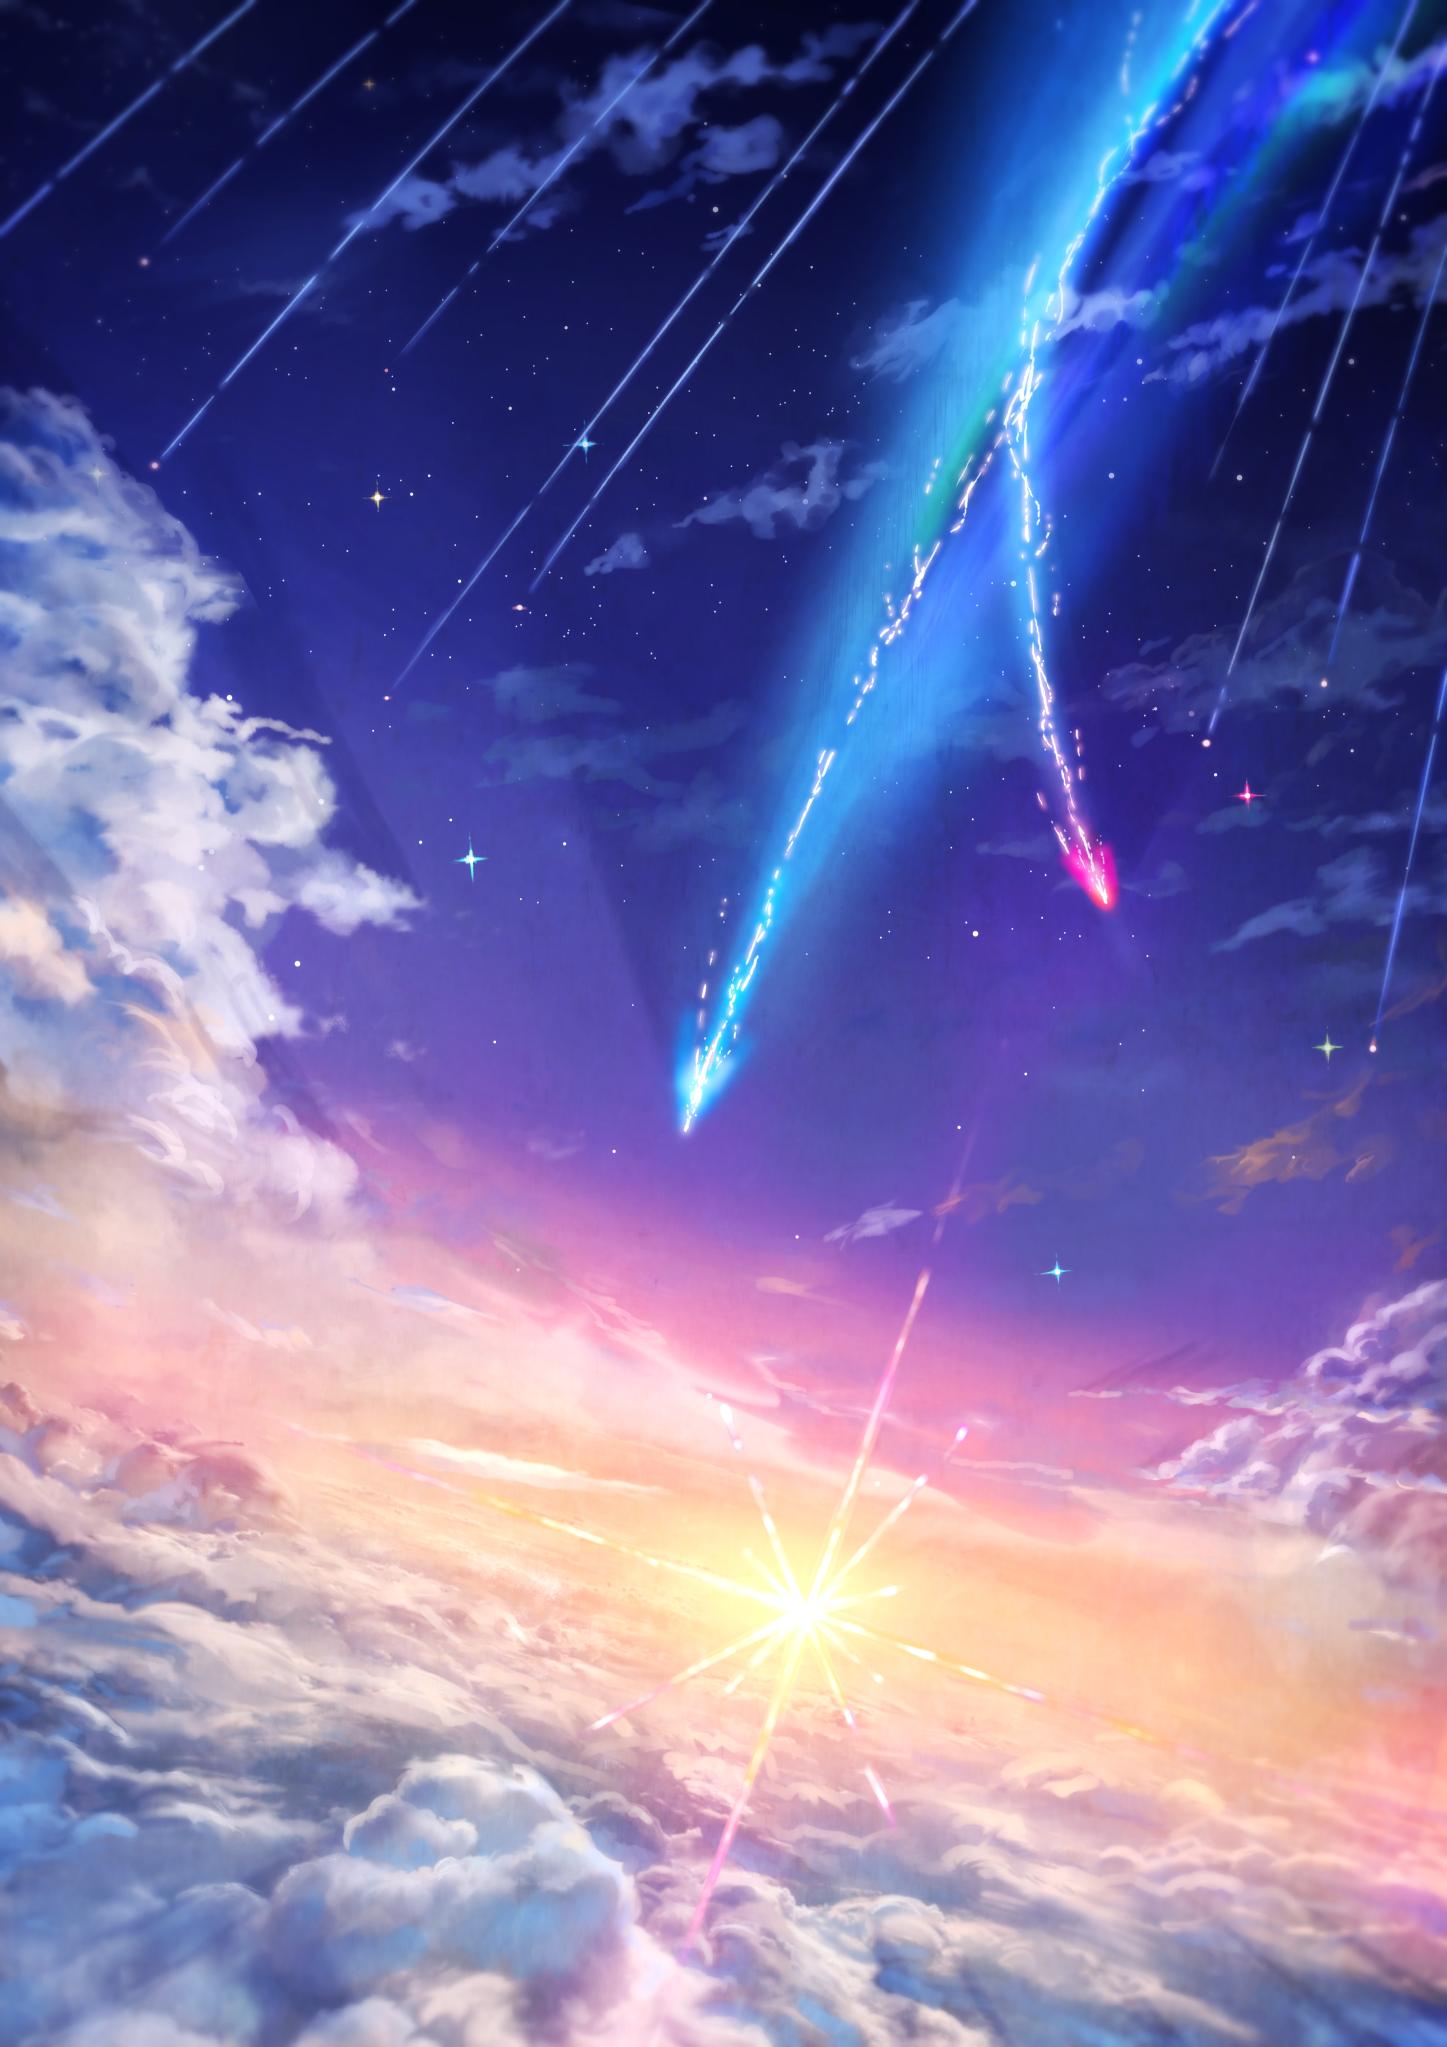 Download Live Wallpaper Kimi No Na Wa Kimi No Na Wa Your Name Zerochan Anime Image Board 1355 Your Name In 2020 Kimi No Na Wa Wallpaper Kimi No Na Wa